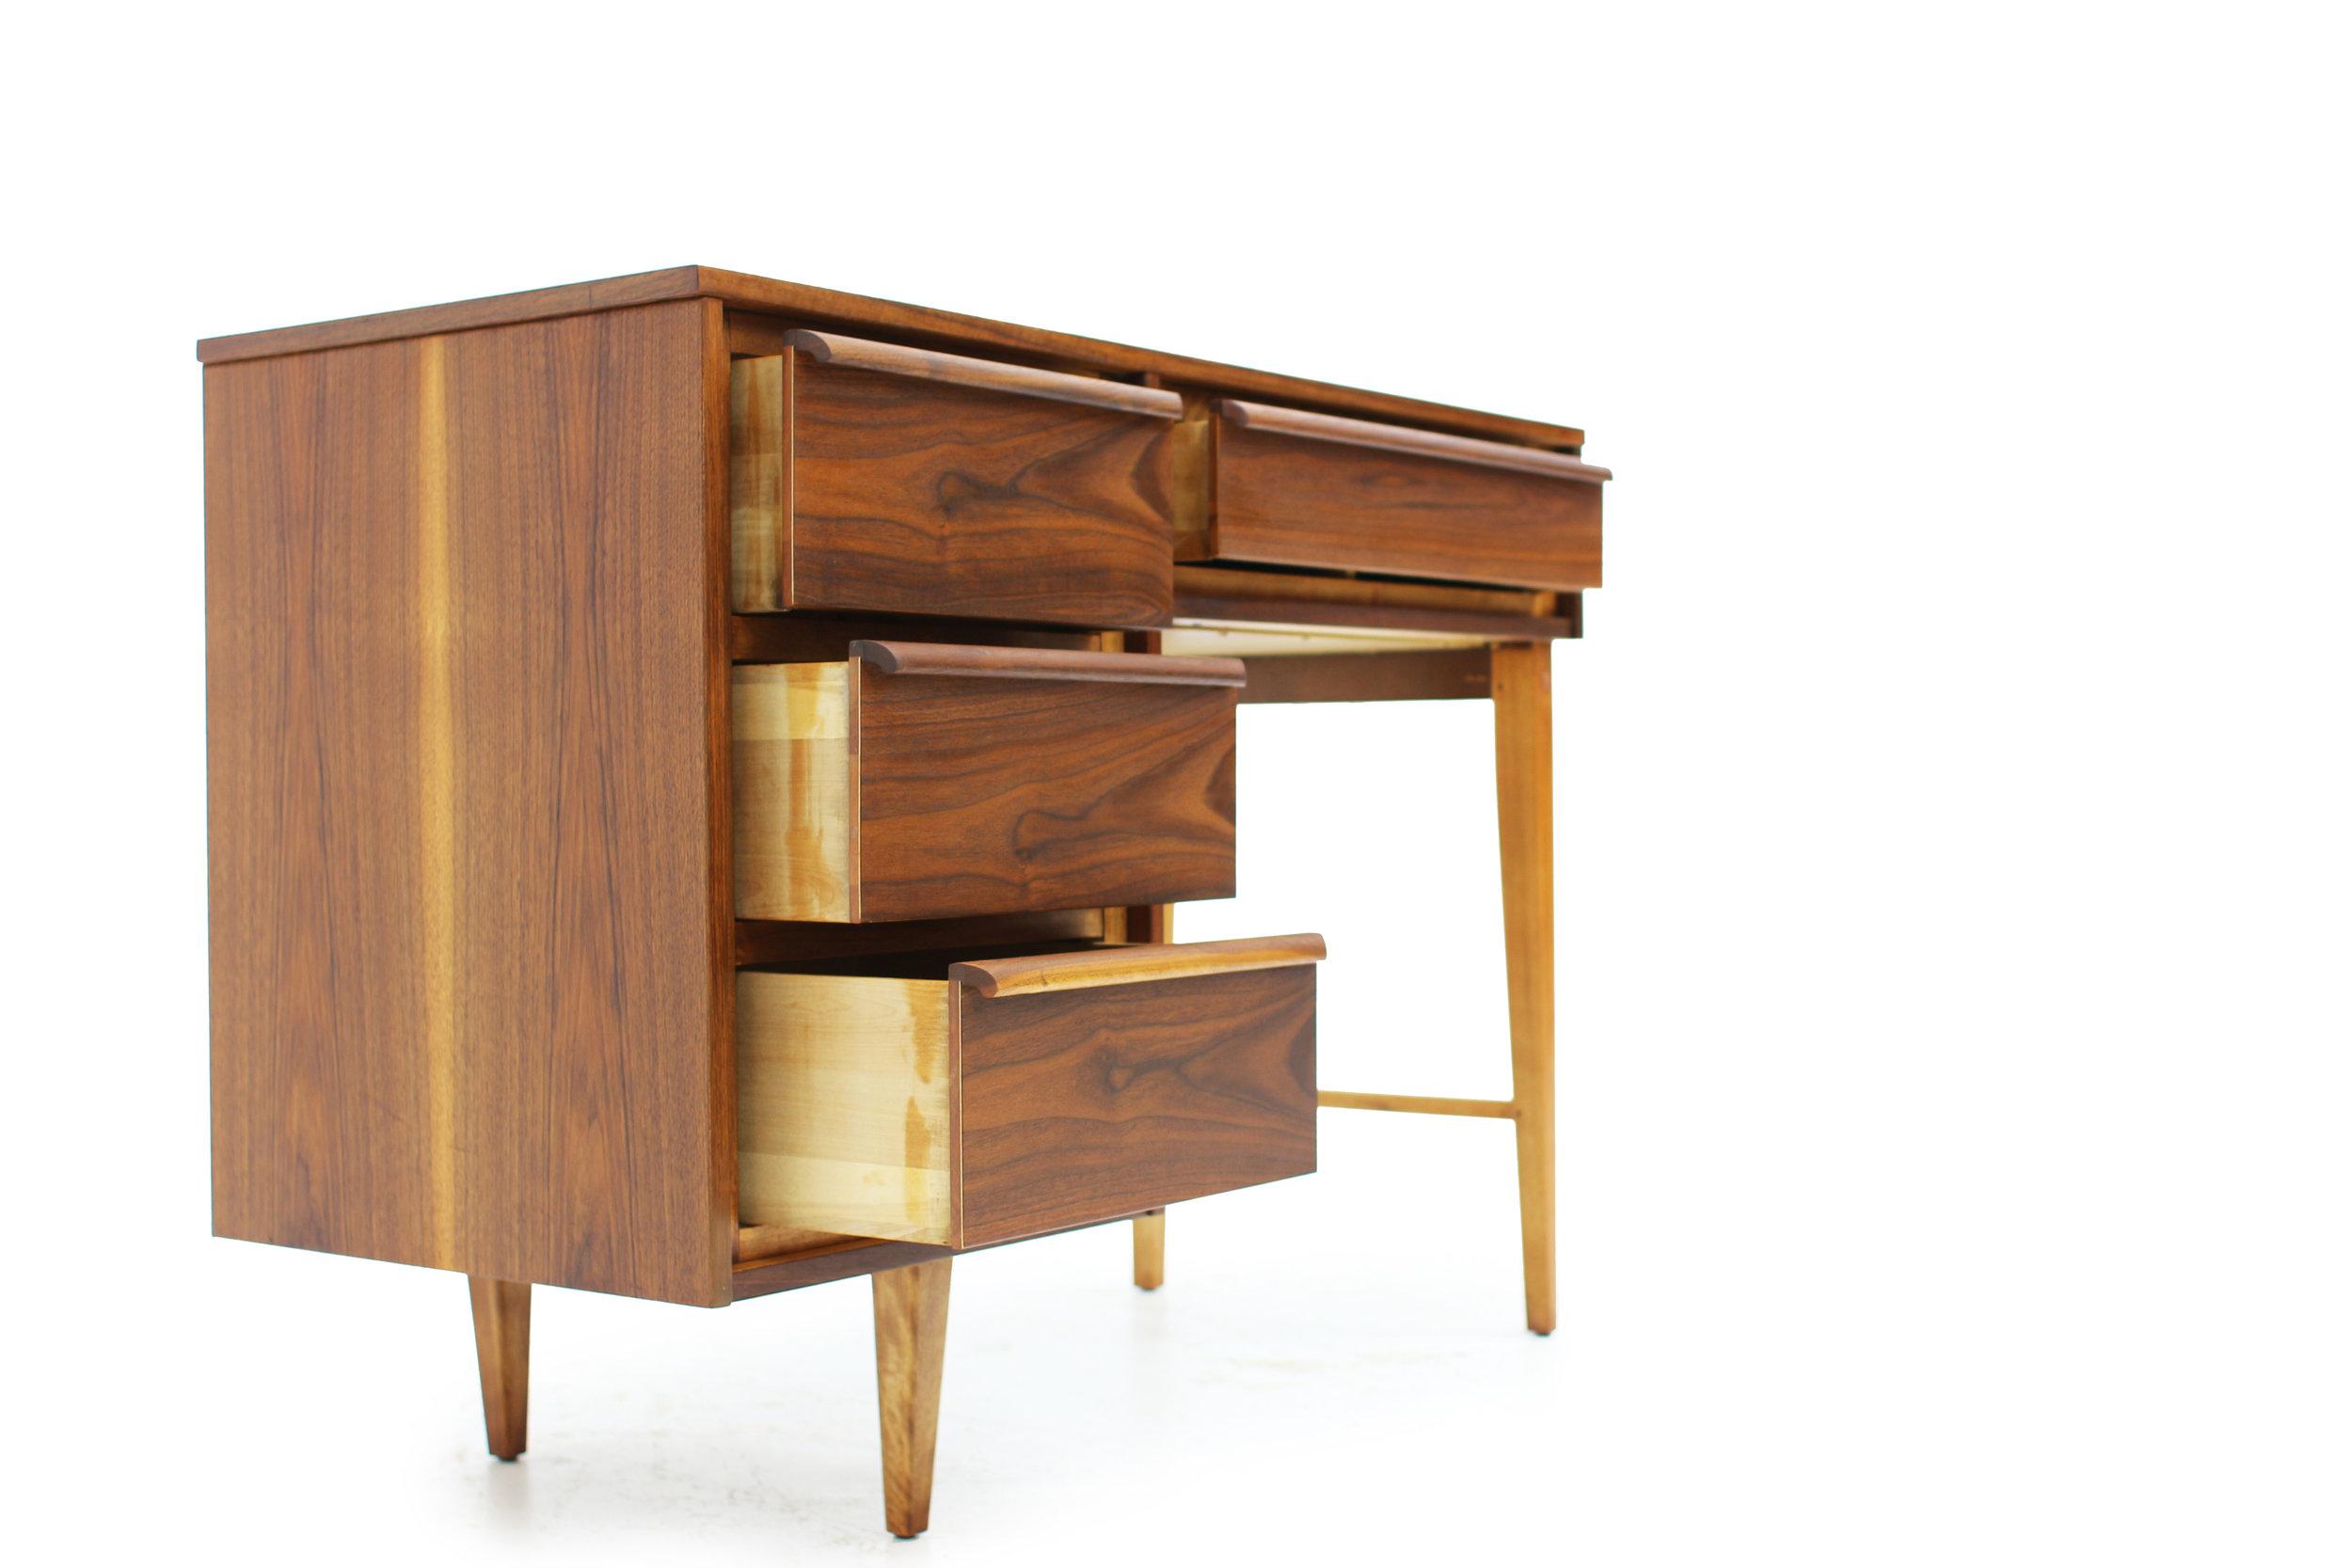 mcm-walnut-small-desk (3).jpg